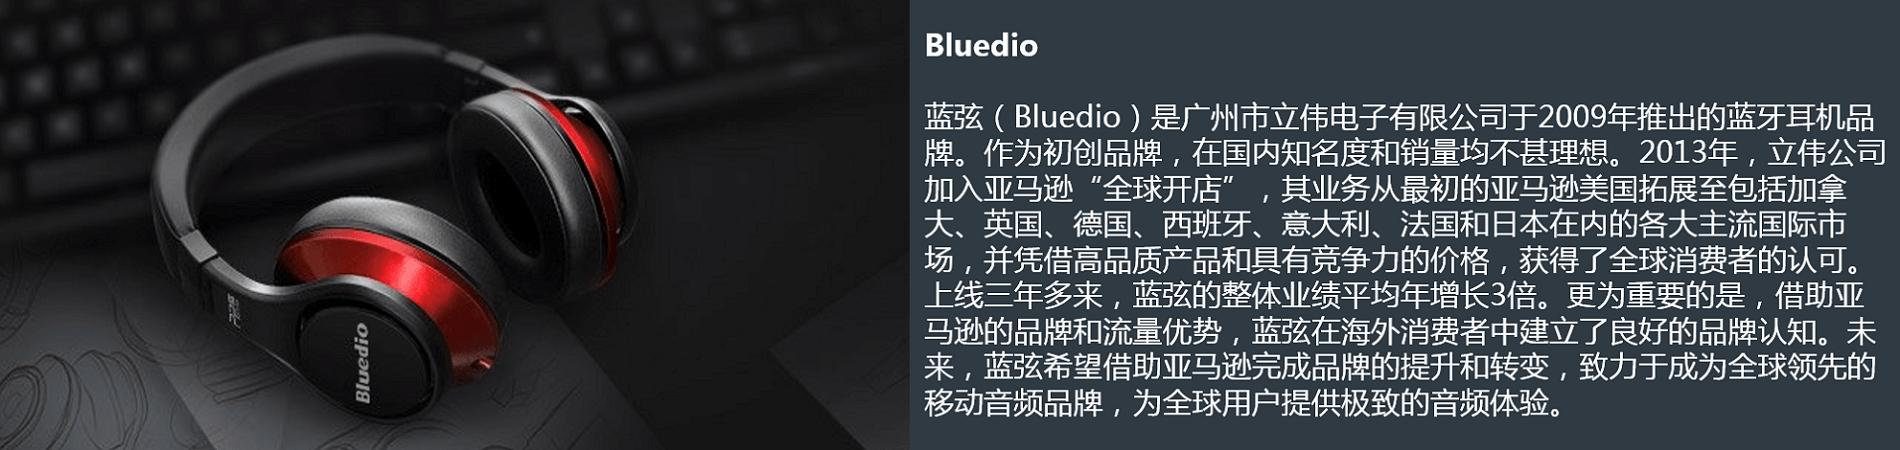 蓝弦(Bluedio)